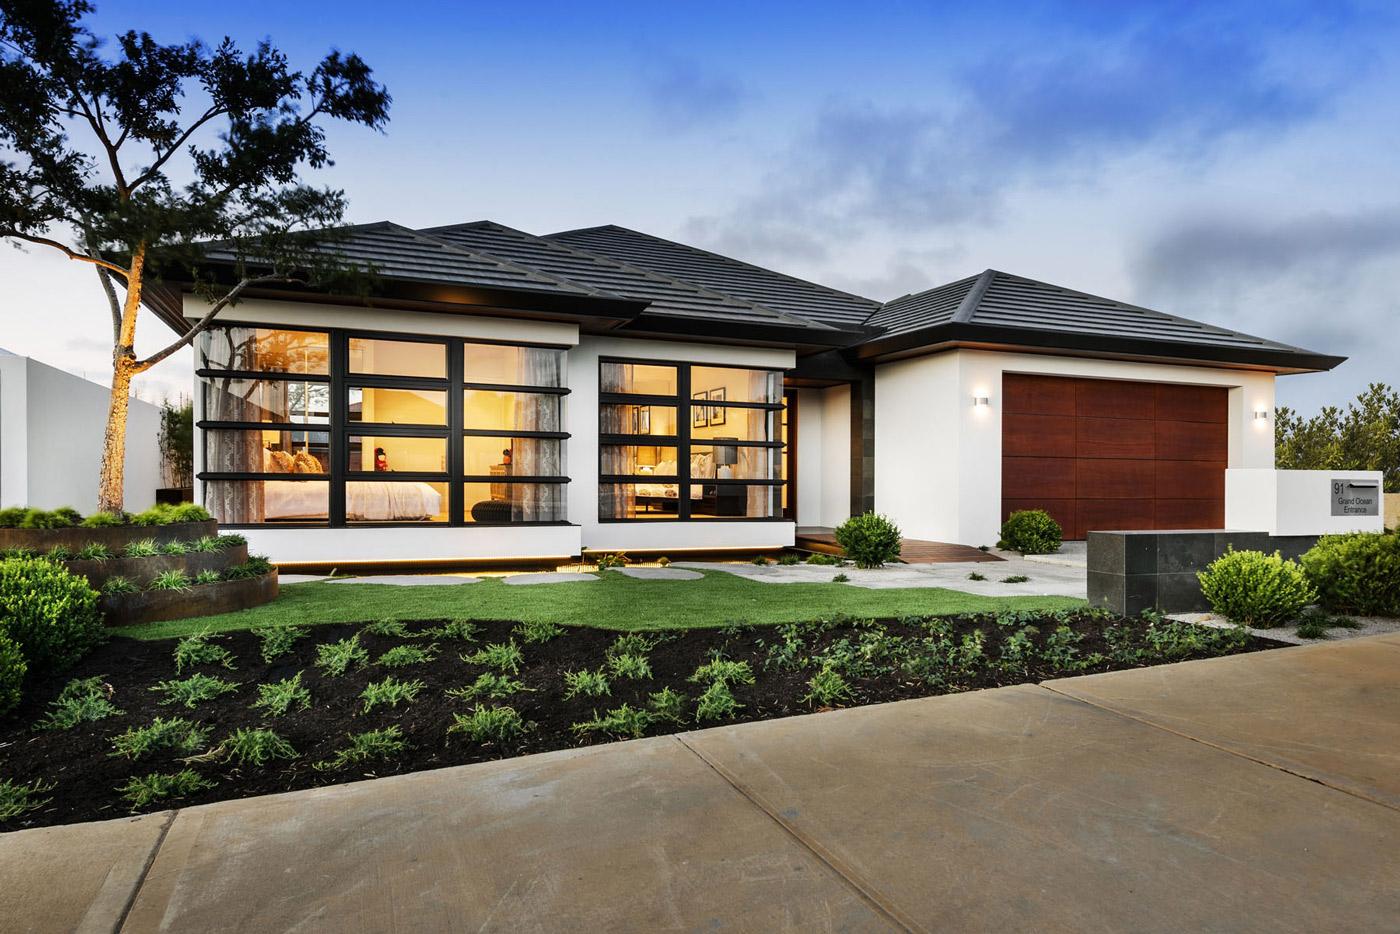 Front Facade, House in Burns Beach, Perth